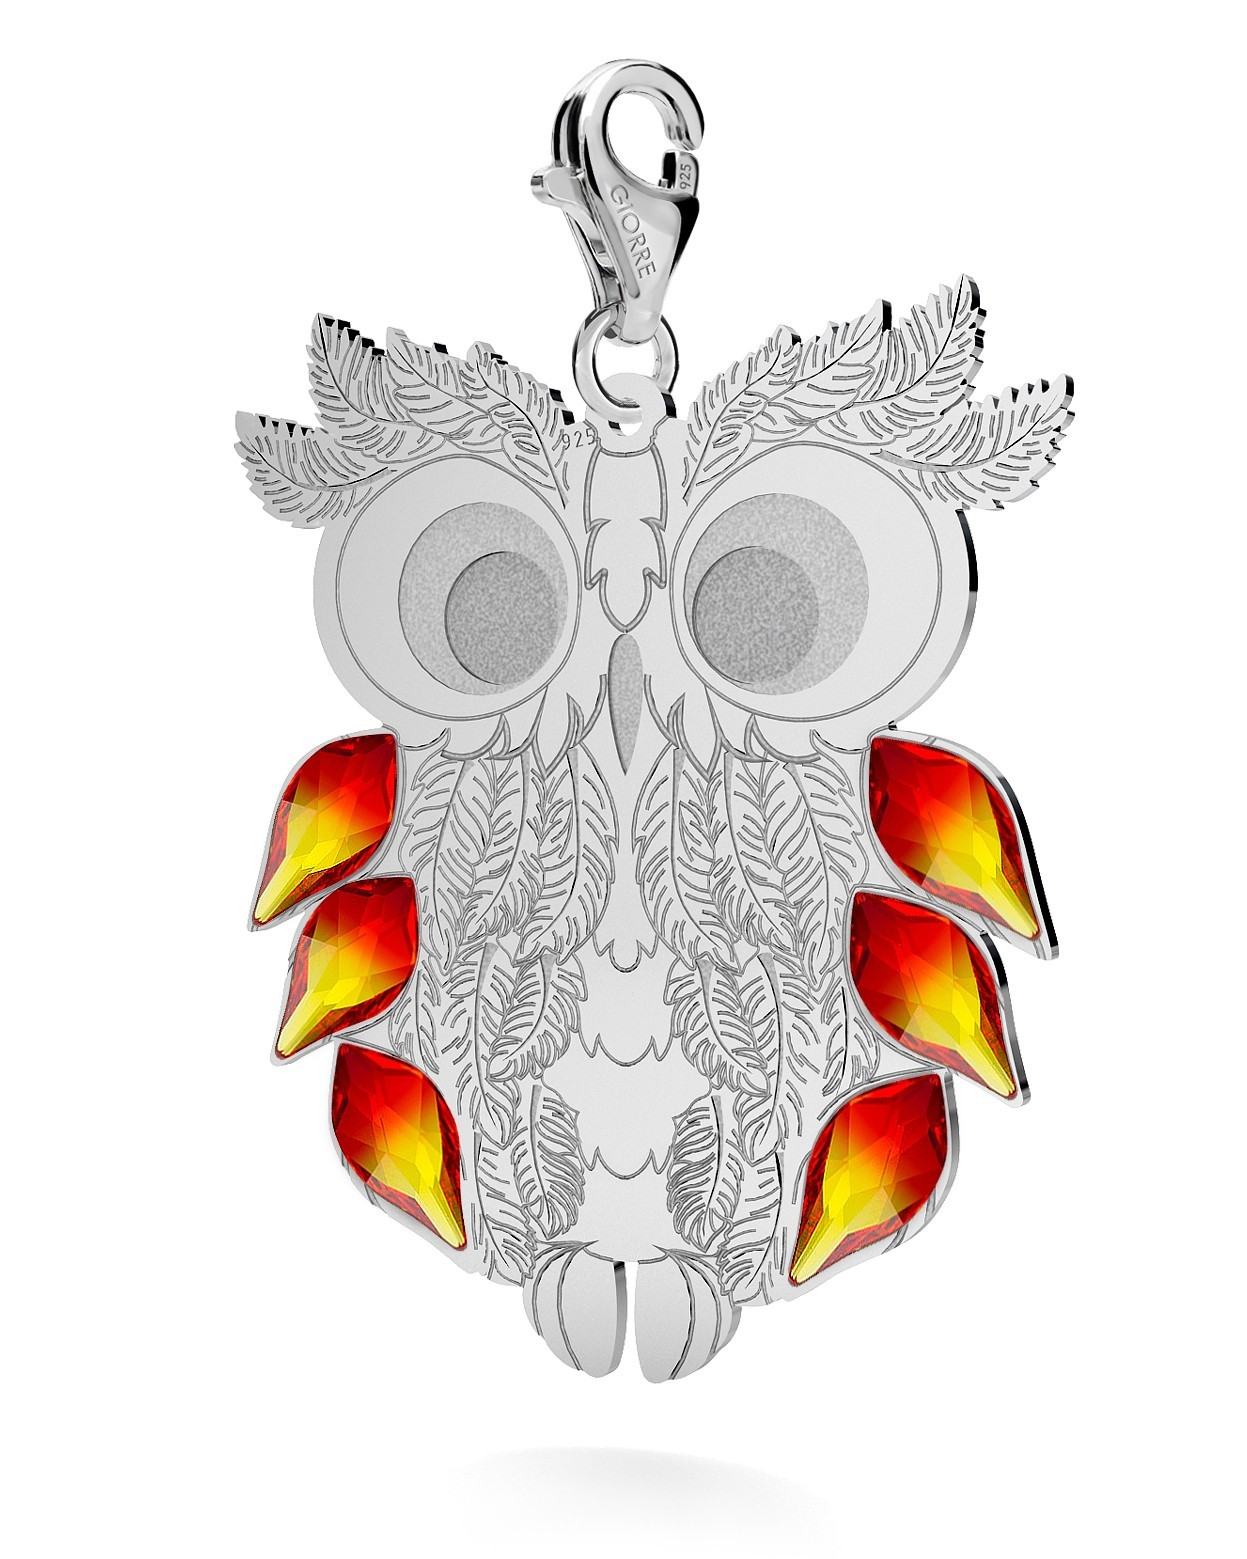 CHARM 143, OWL, SWAROVSKI 2205 MM 7,5, STERLING SILVER (925) RHODIUM OR GOLD PLATE